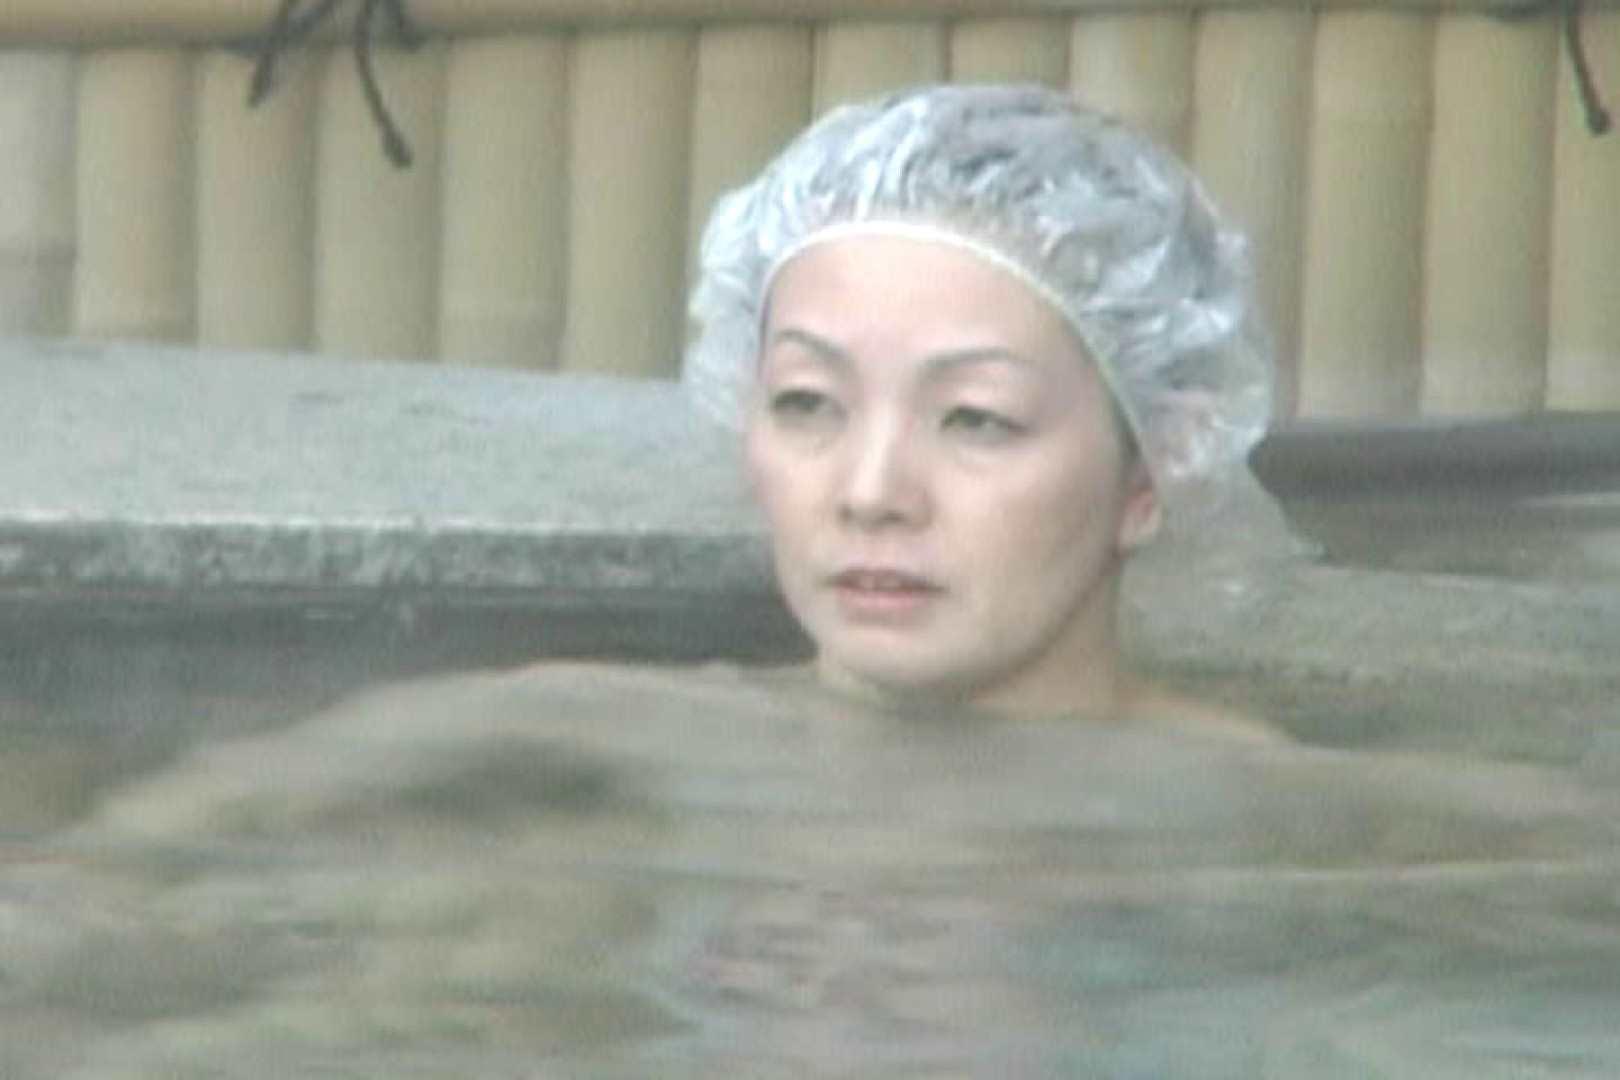 Aquaな露天風呂Vol.592 盗撮師作品  91pic 33